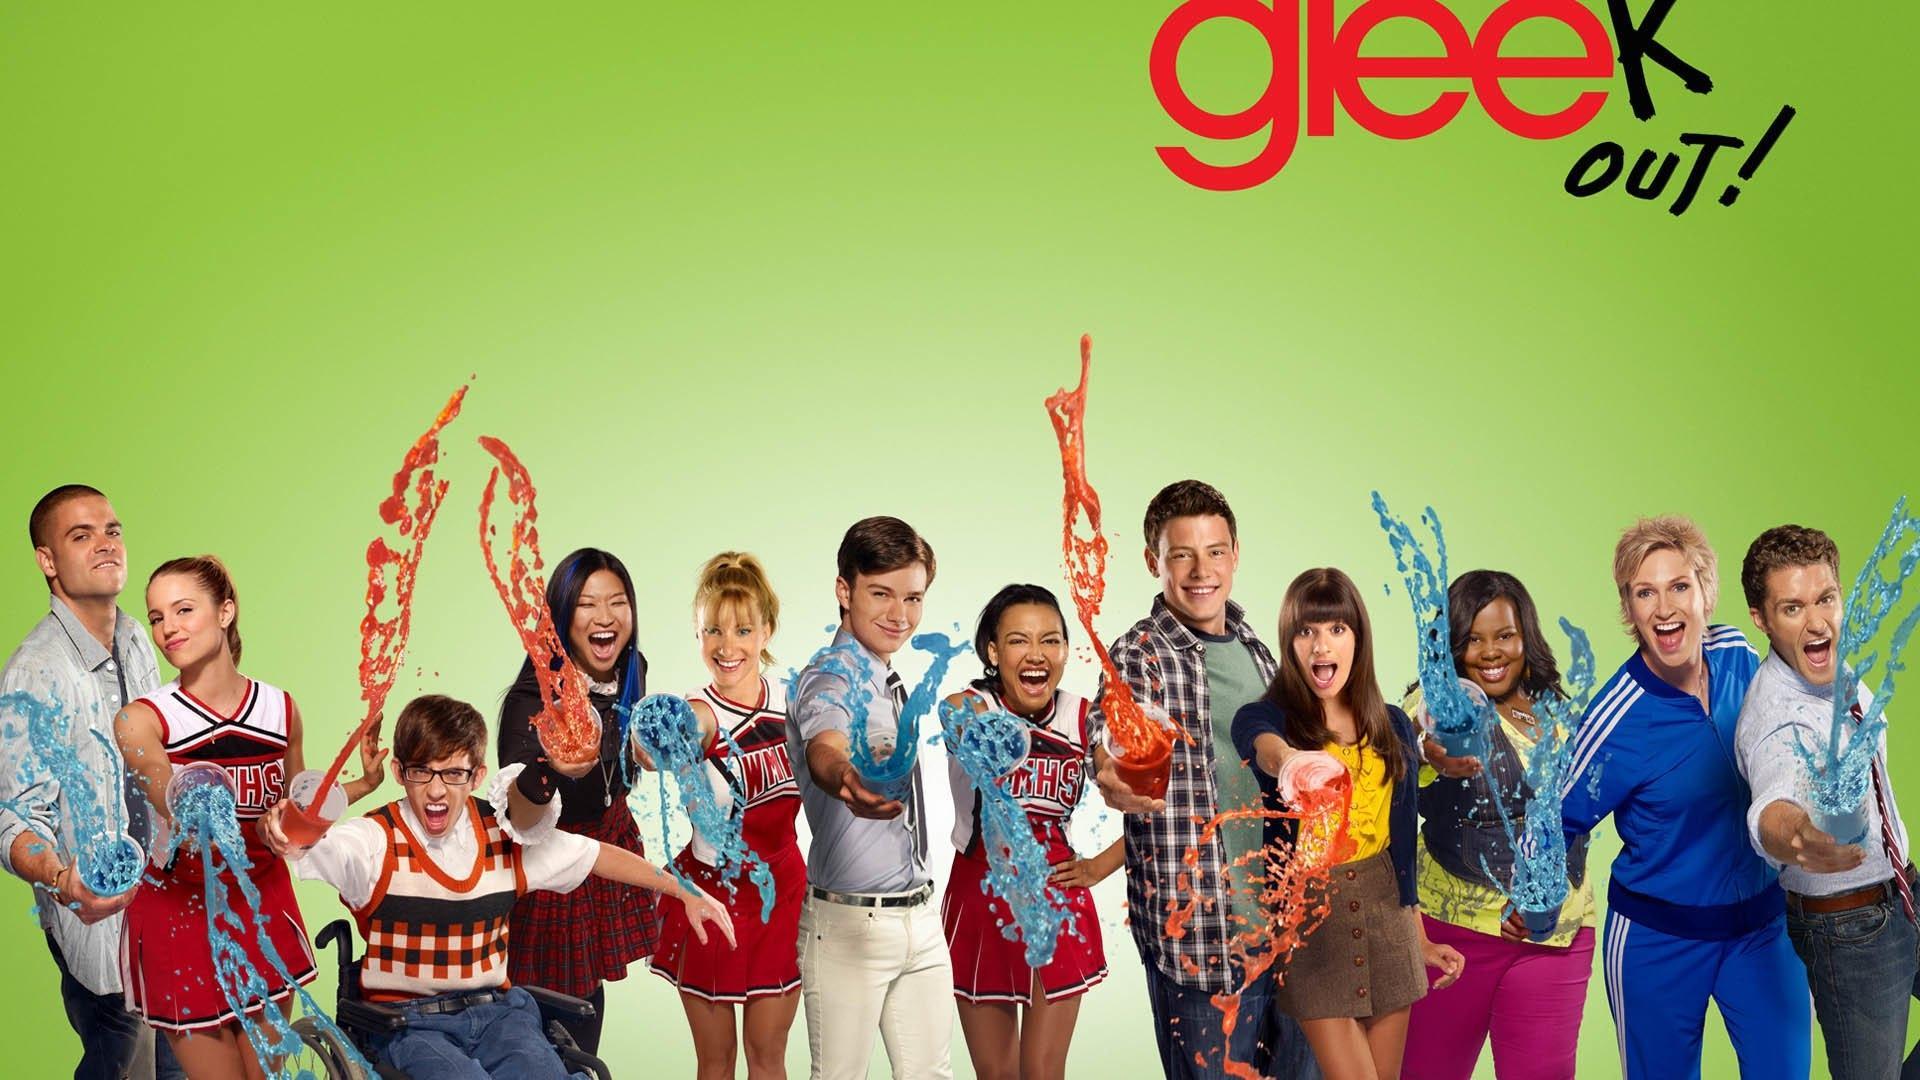 Glee Wallpaper Hd Download